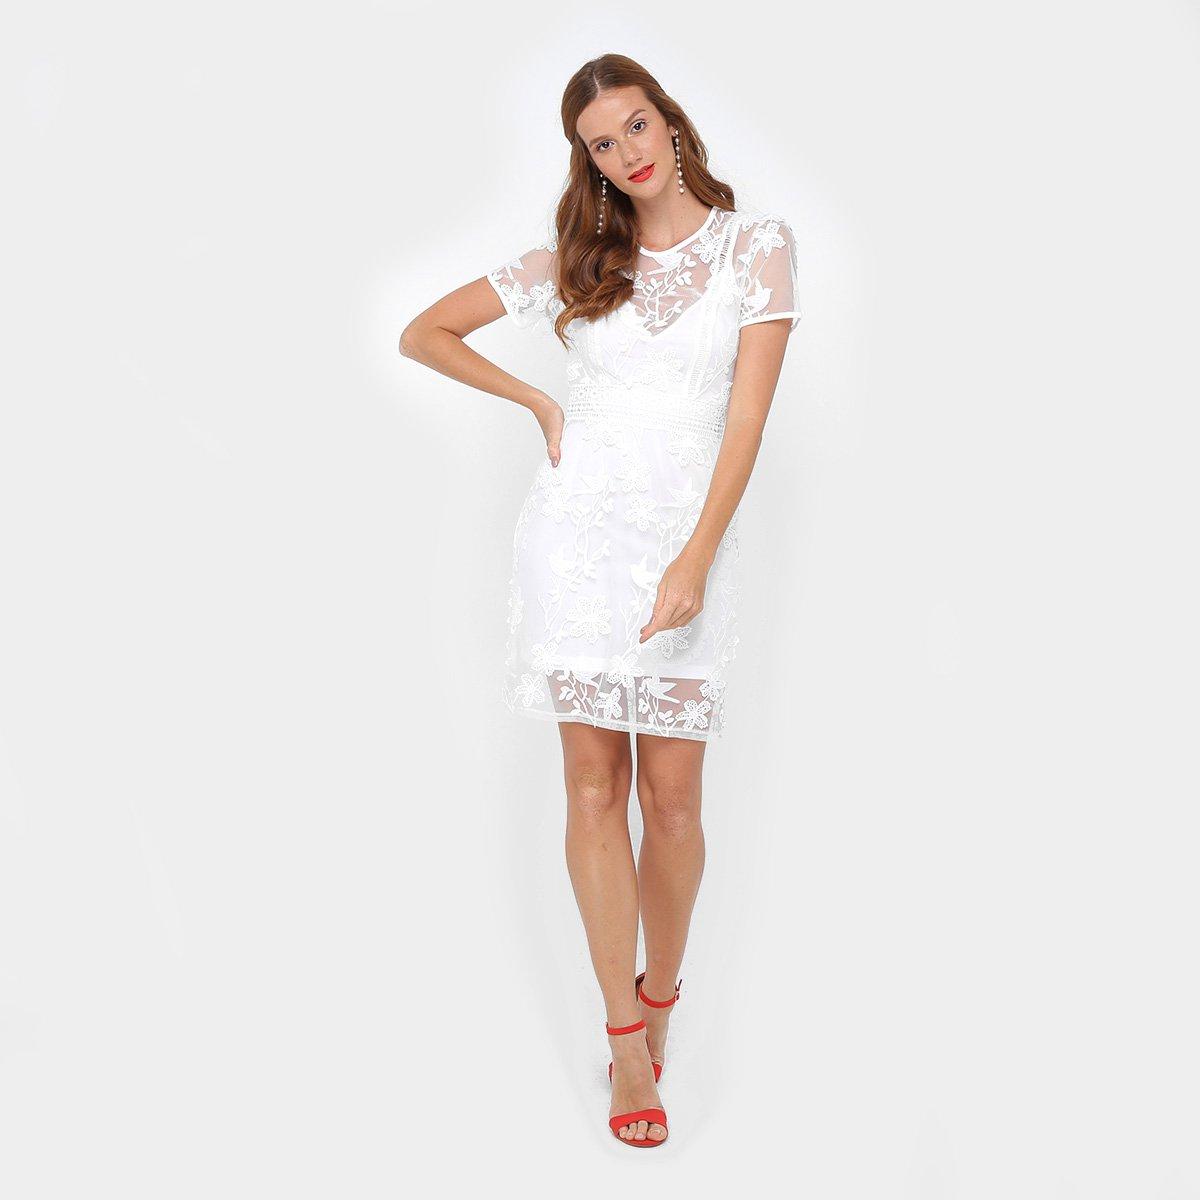 Vestido Colcci Evasê Curto Tule Bordado Com Forro - Compre Agora ... f5a77bae365bb